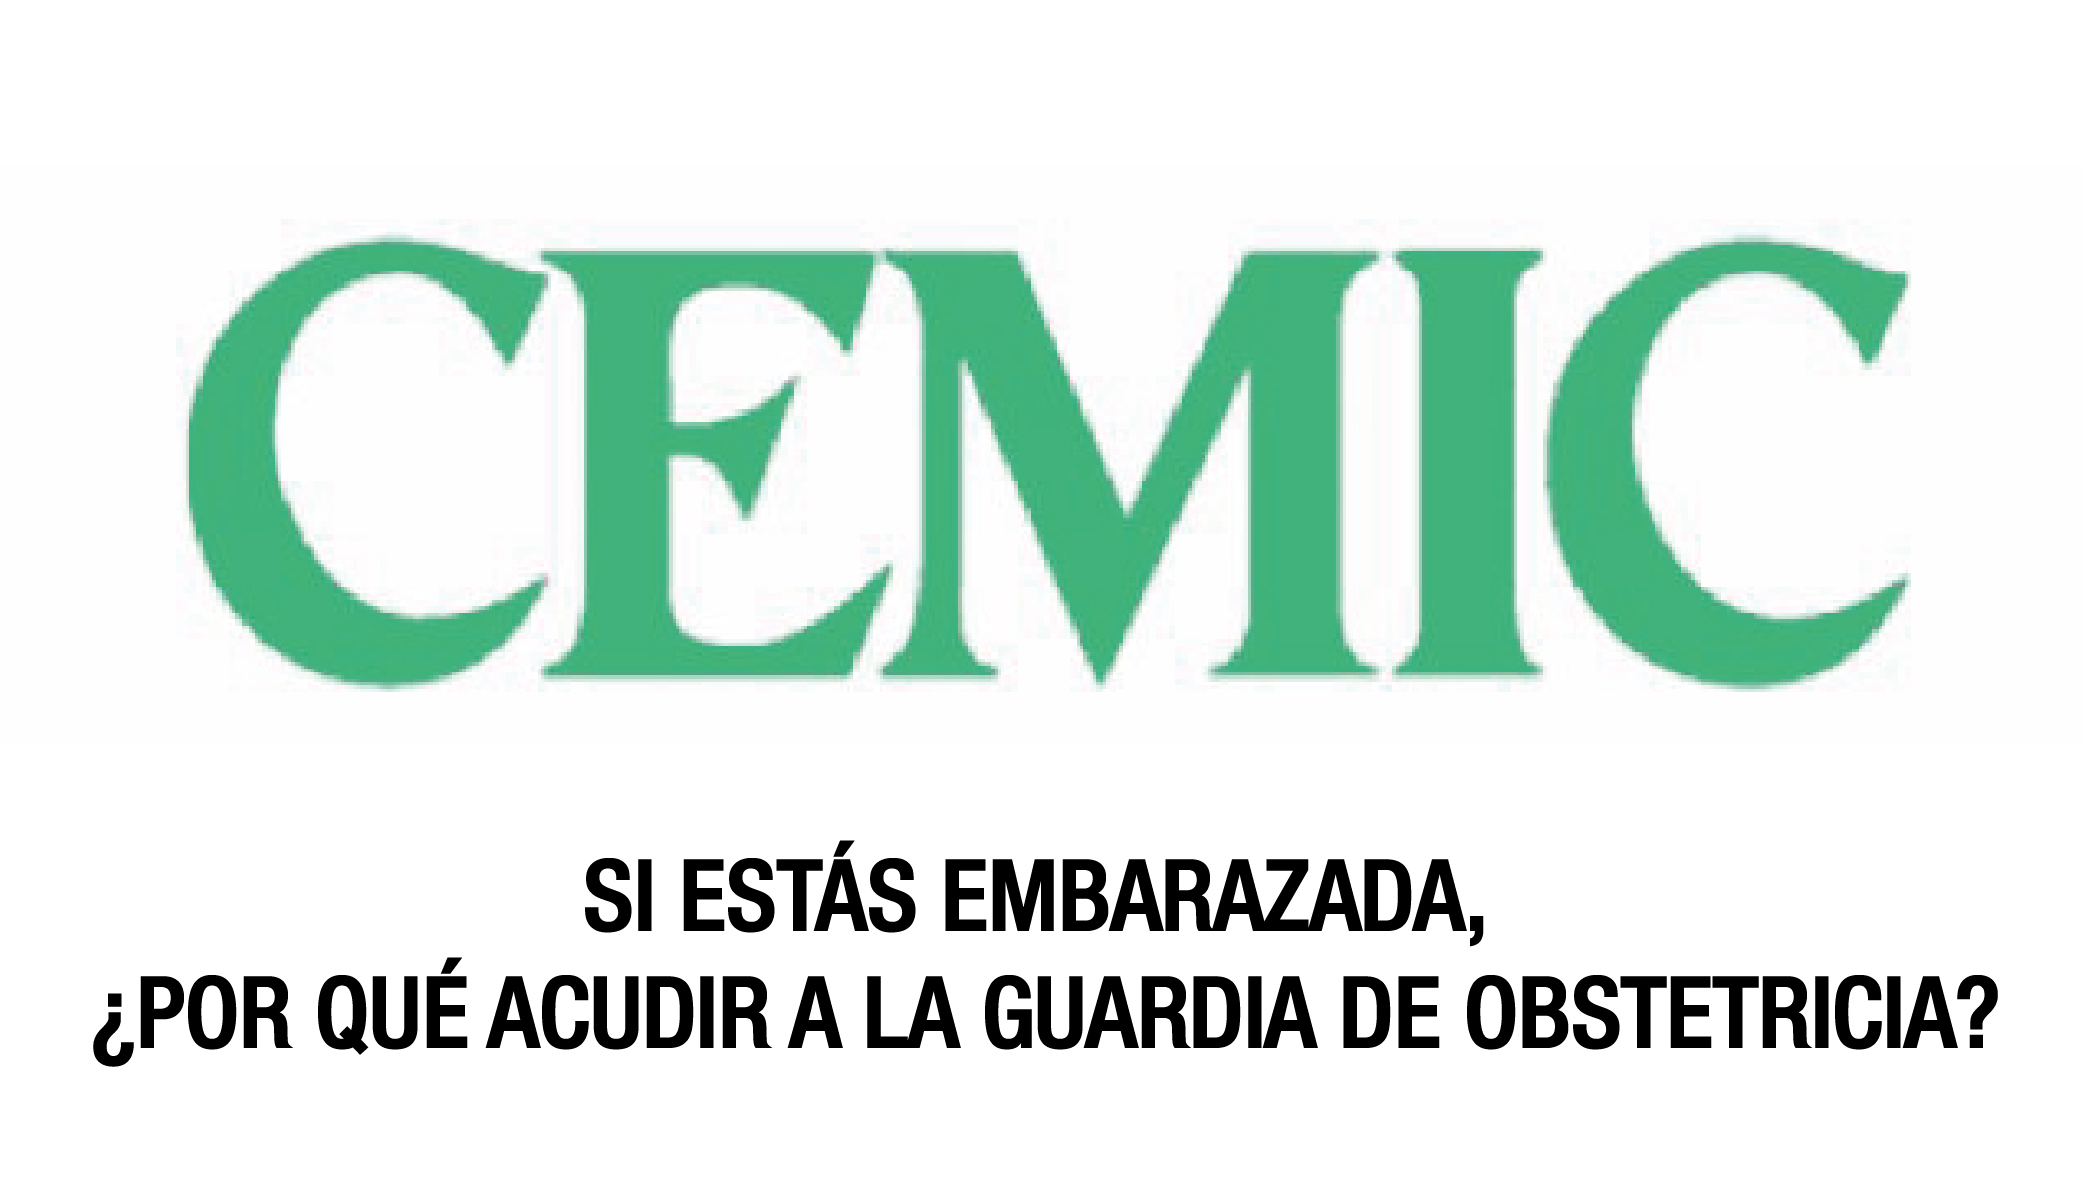 Cemic-01